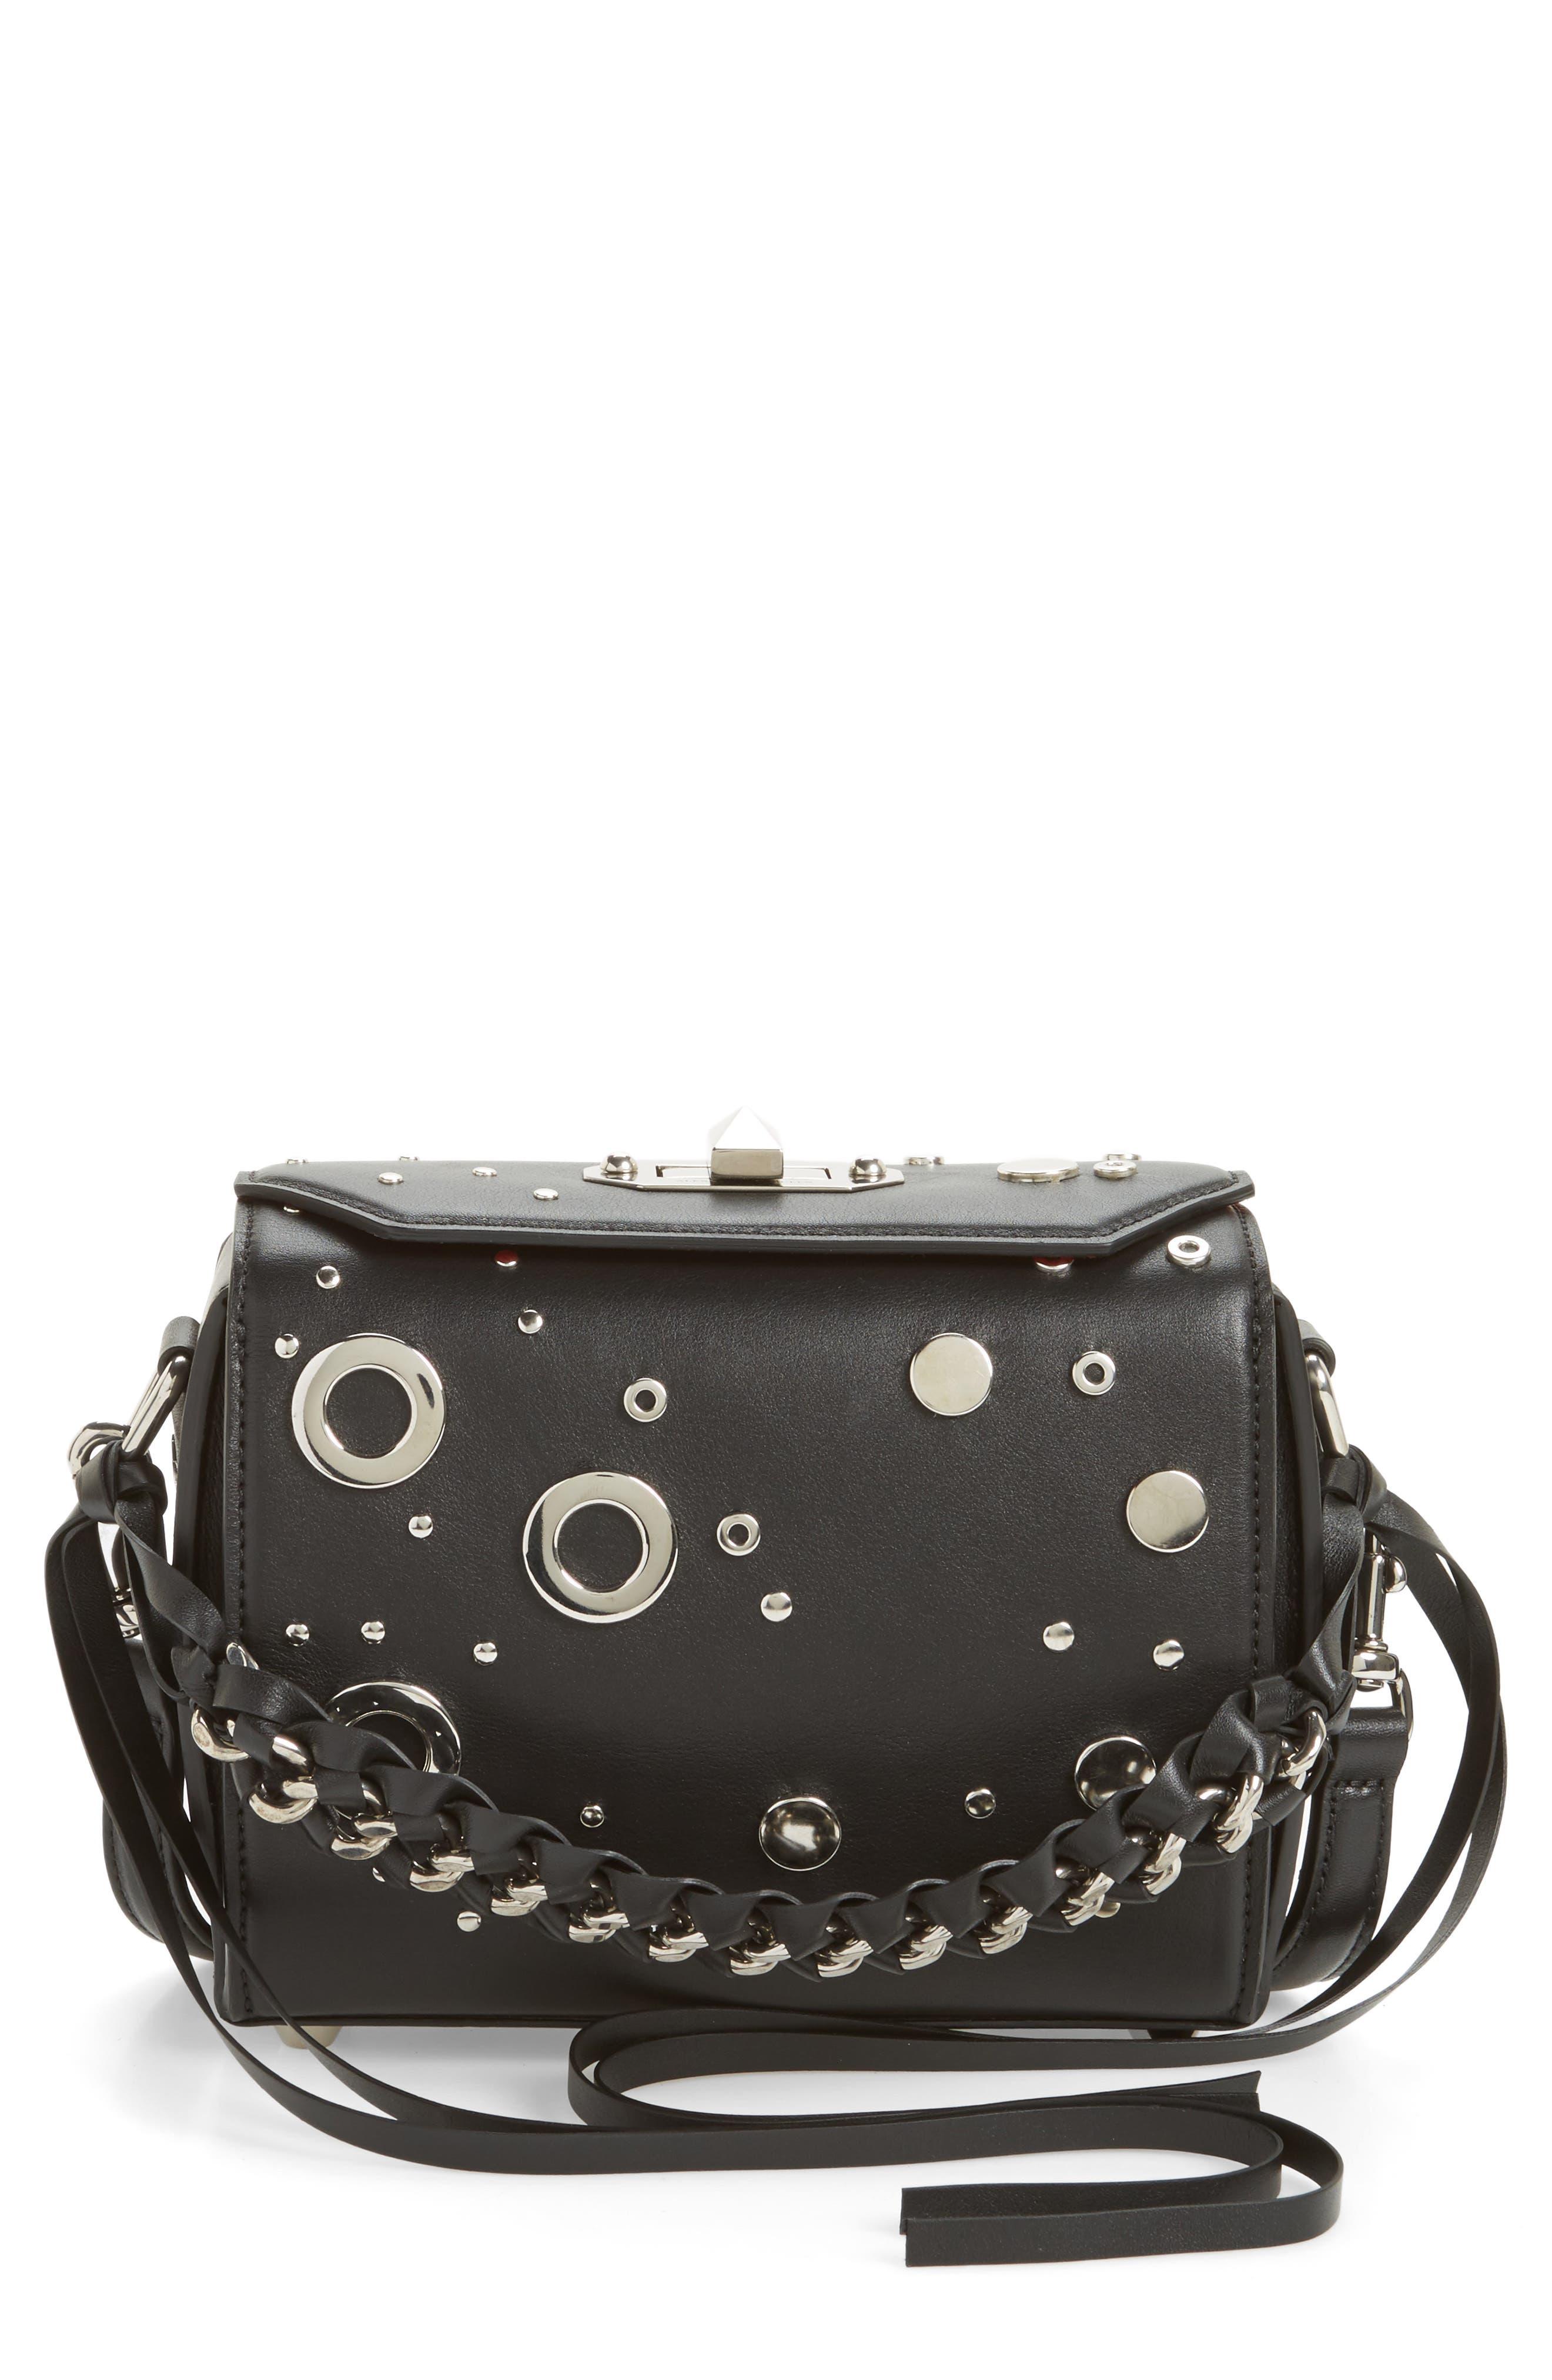 Main Image - Alexander McQueen Grommet & Stud Calfskin Leather Box Bag